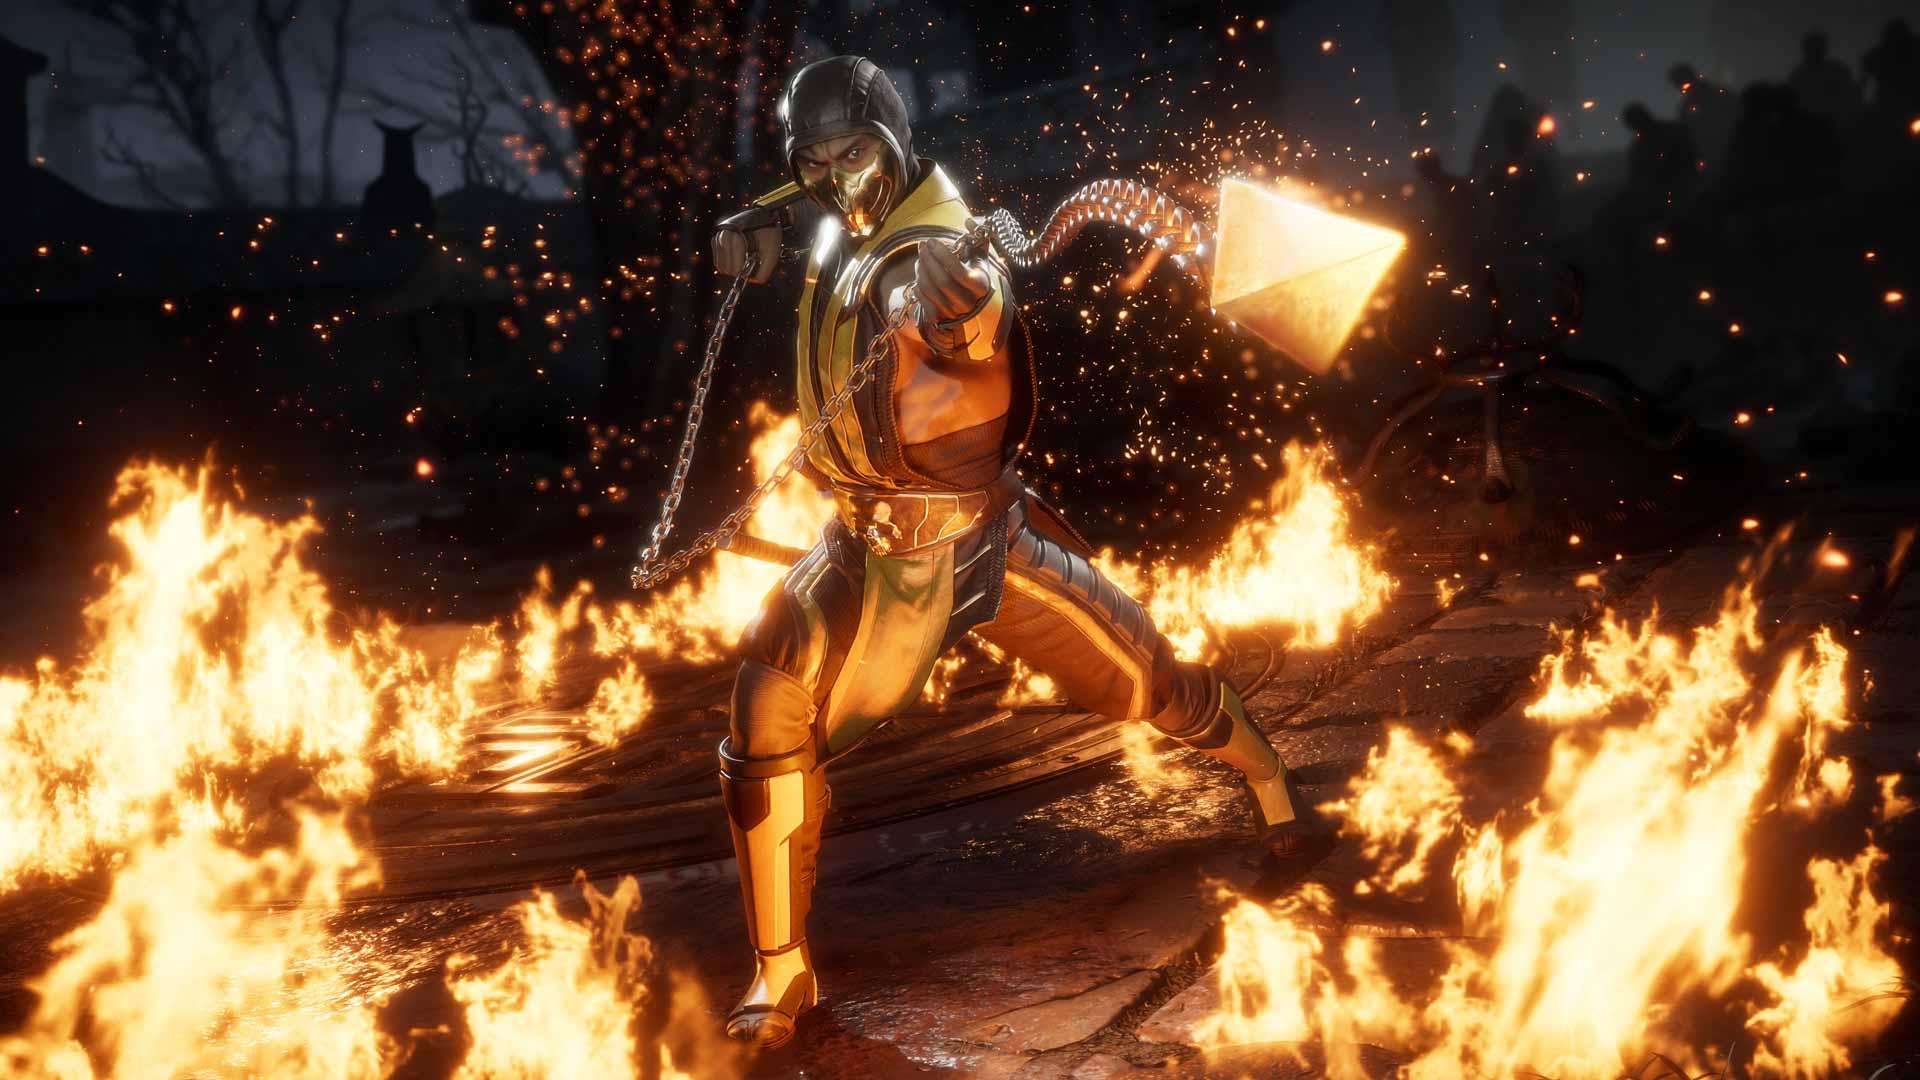 Mortal Kombat 11 Xbox Series X